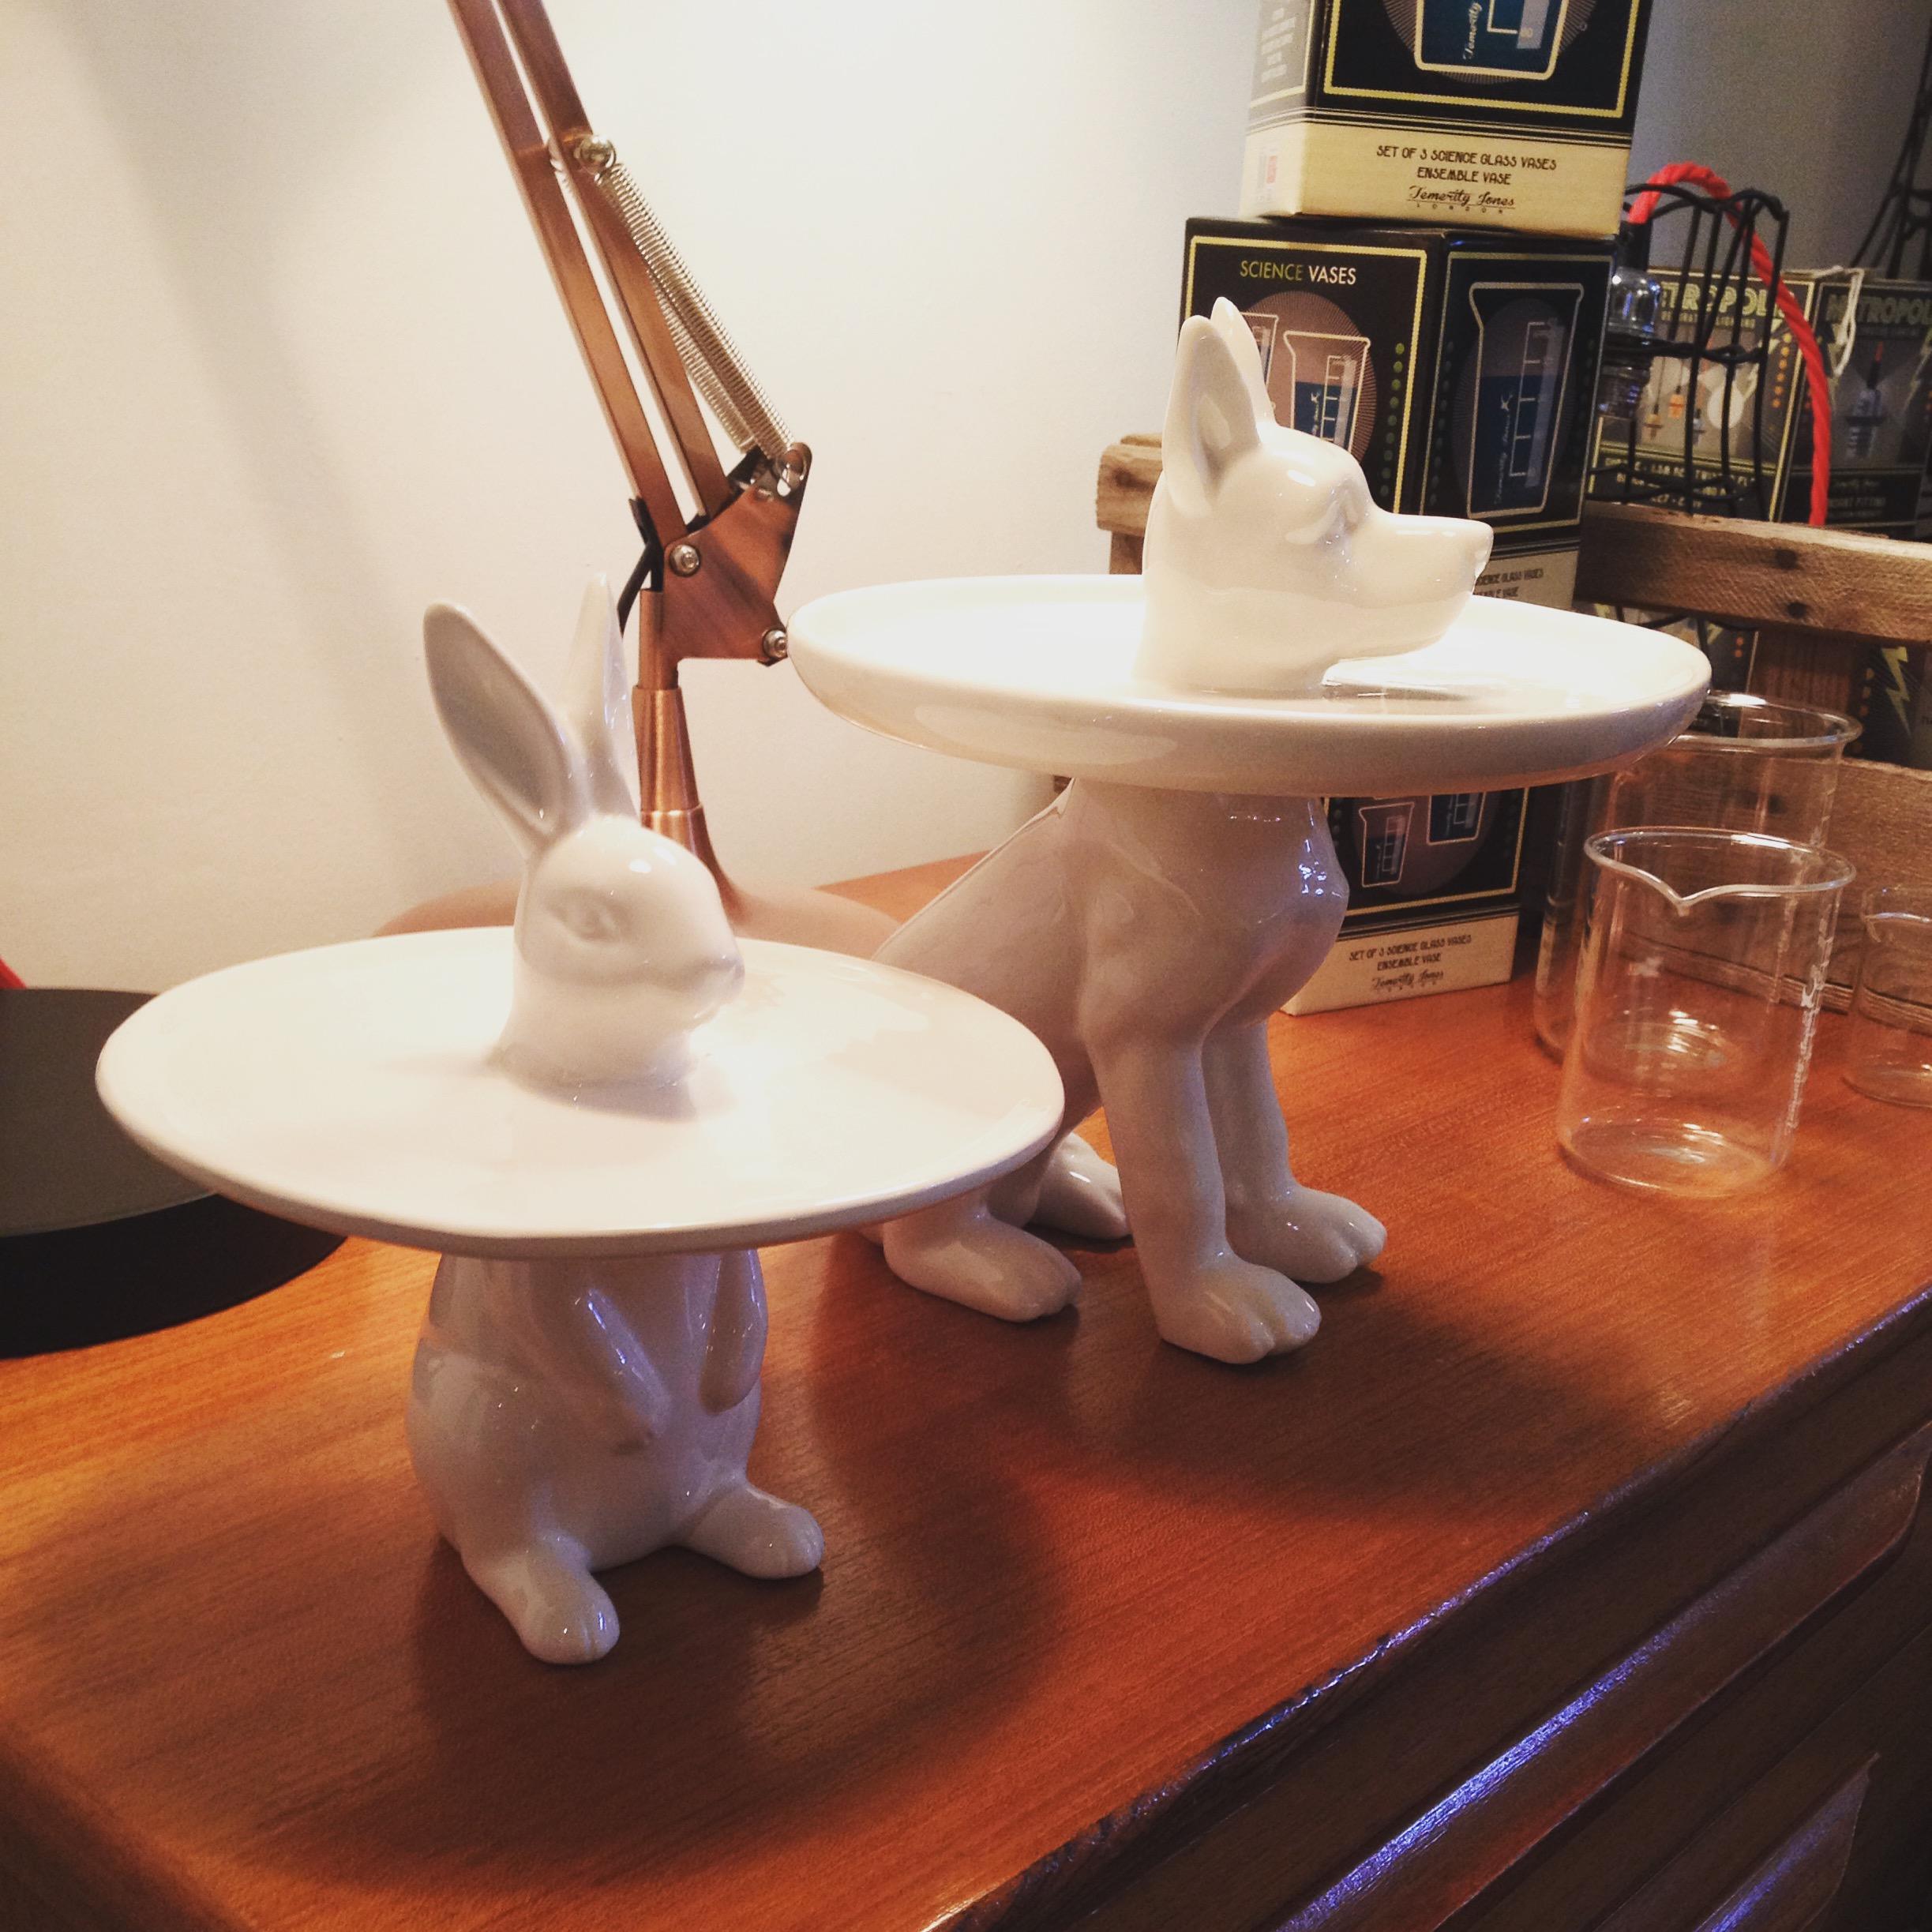 Ceramic Rabbit and Dog plates